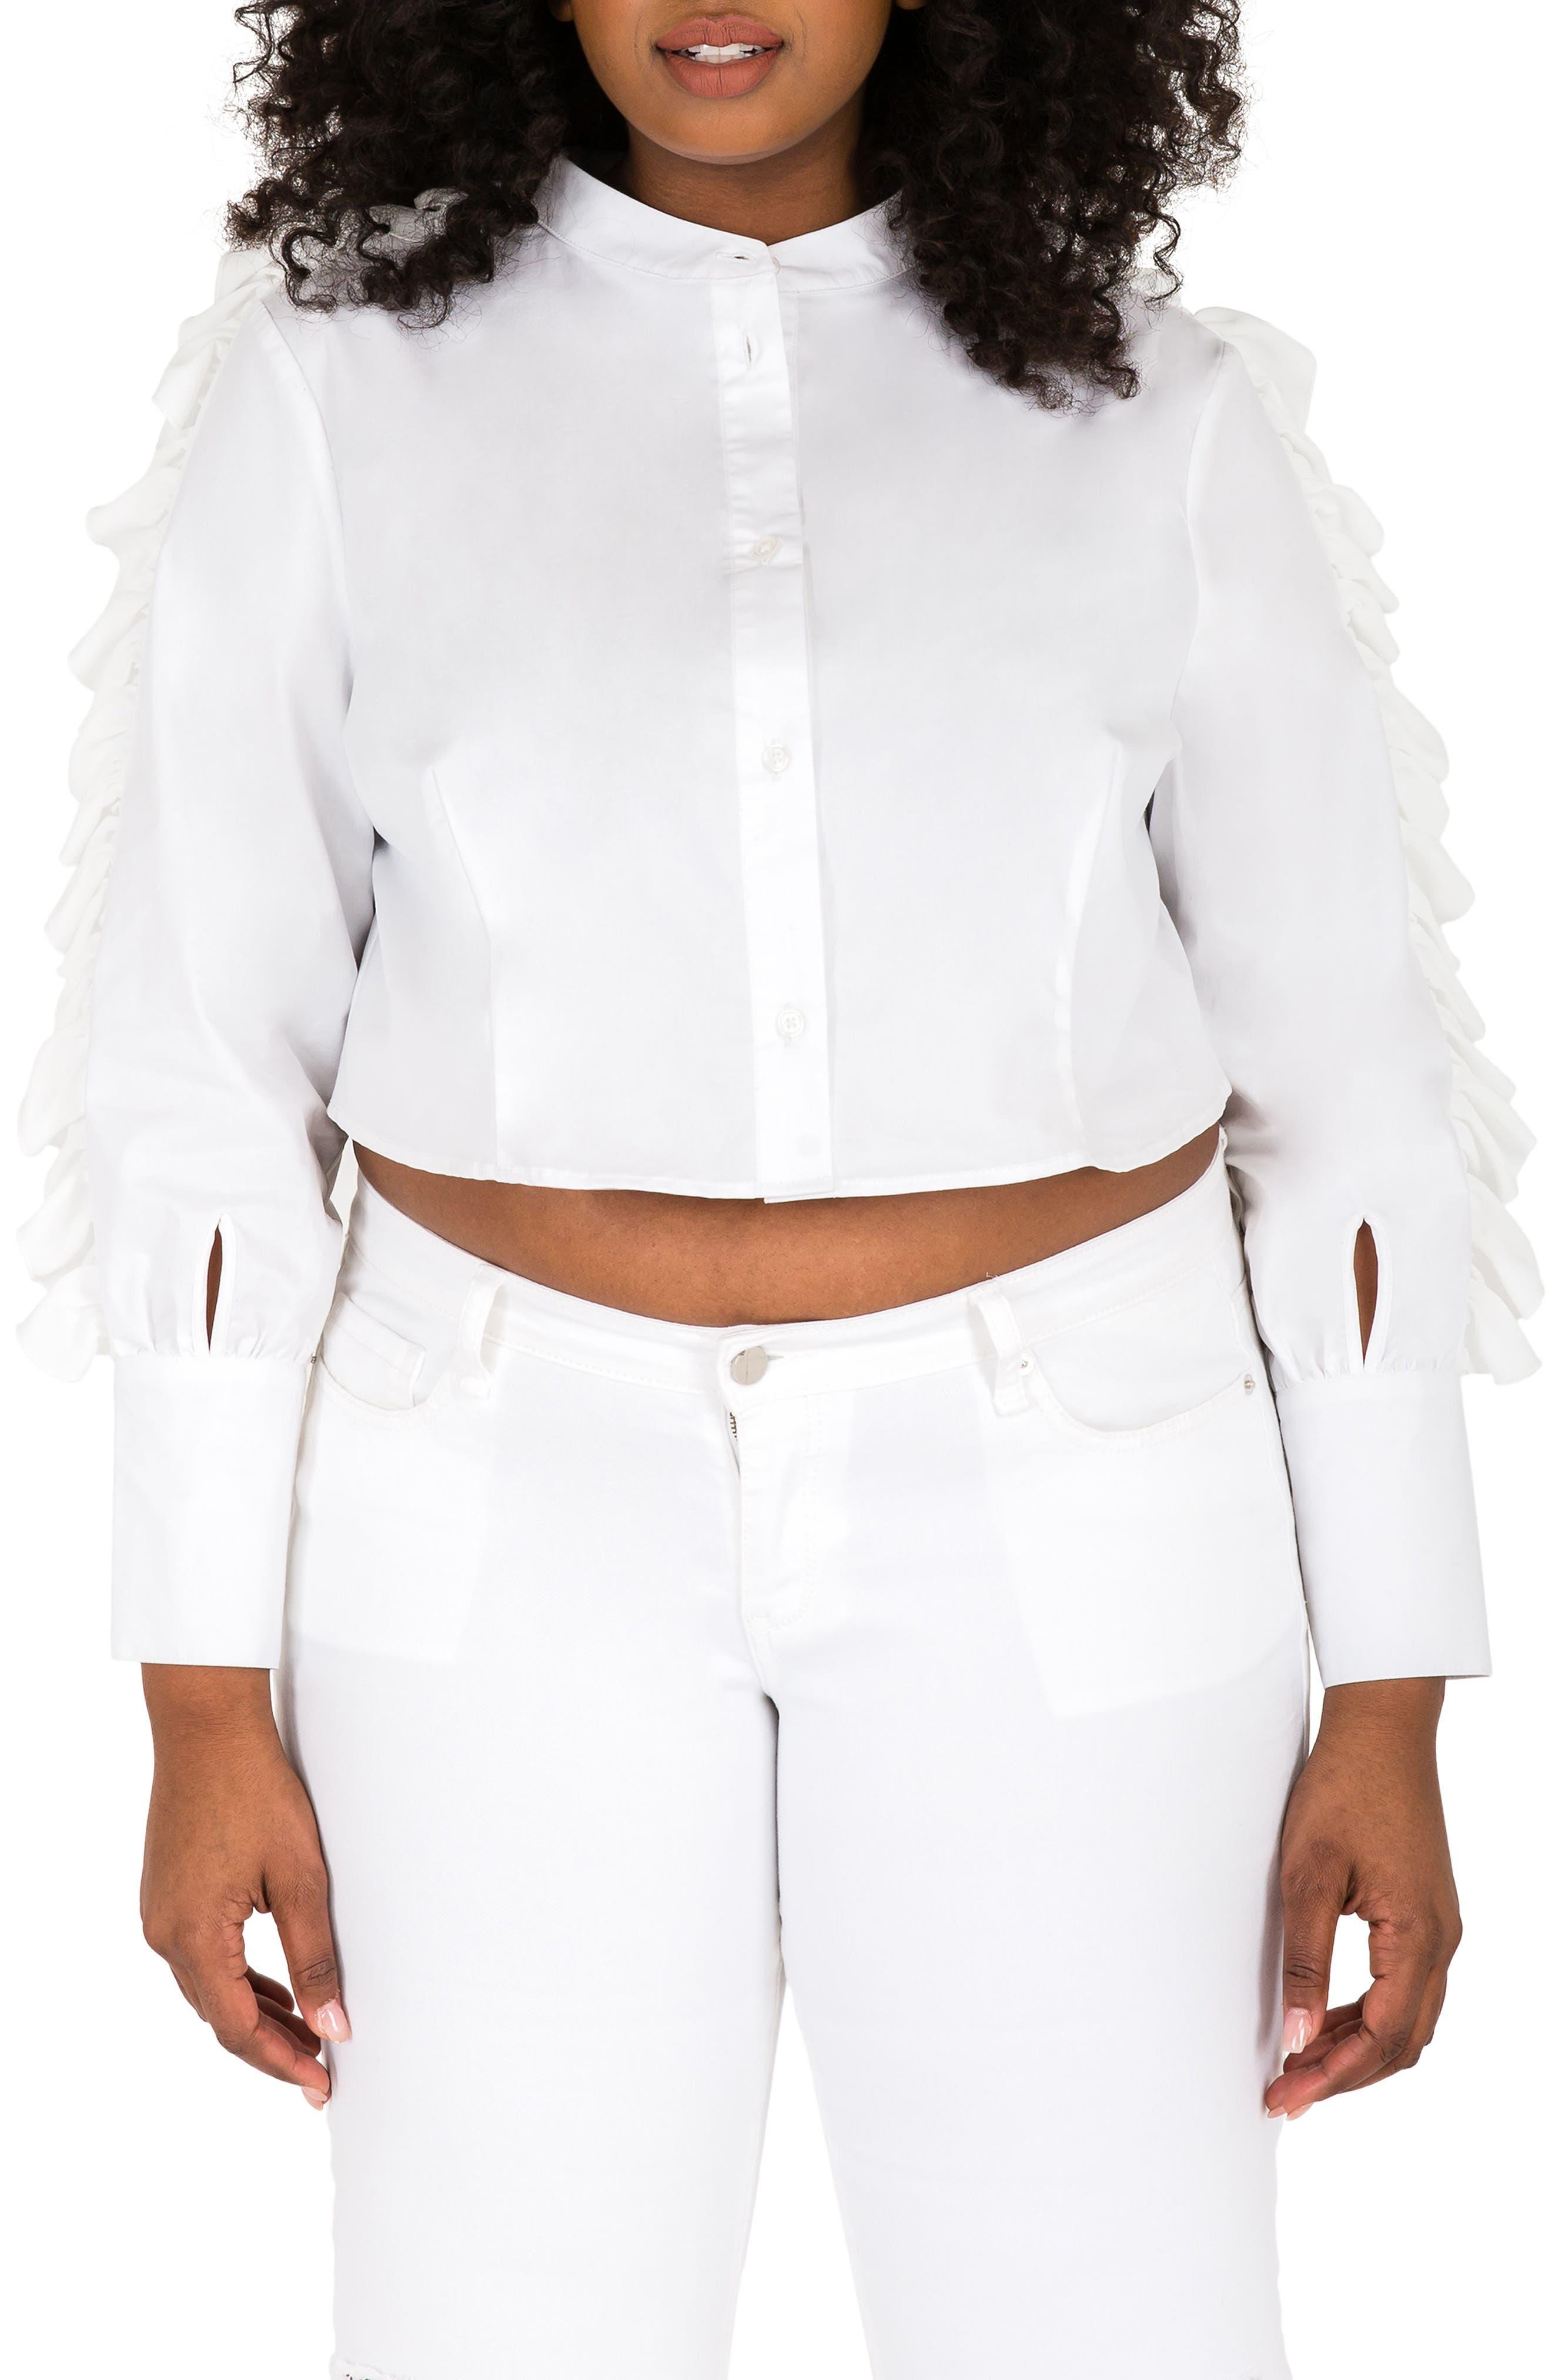 Main Image - Poetic Justice Mayasia Ruffle Sleeve Crop Shirt (Plus Size)